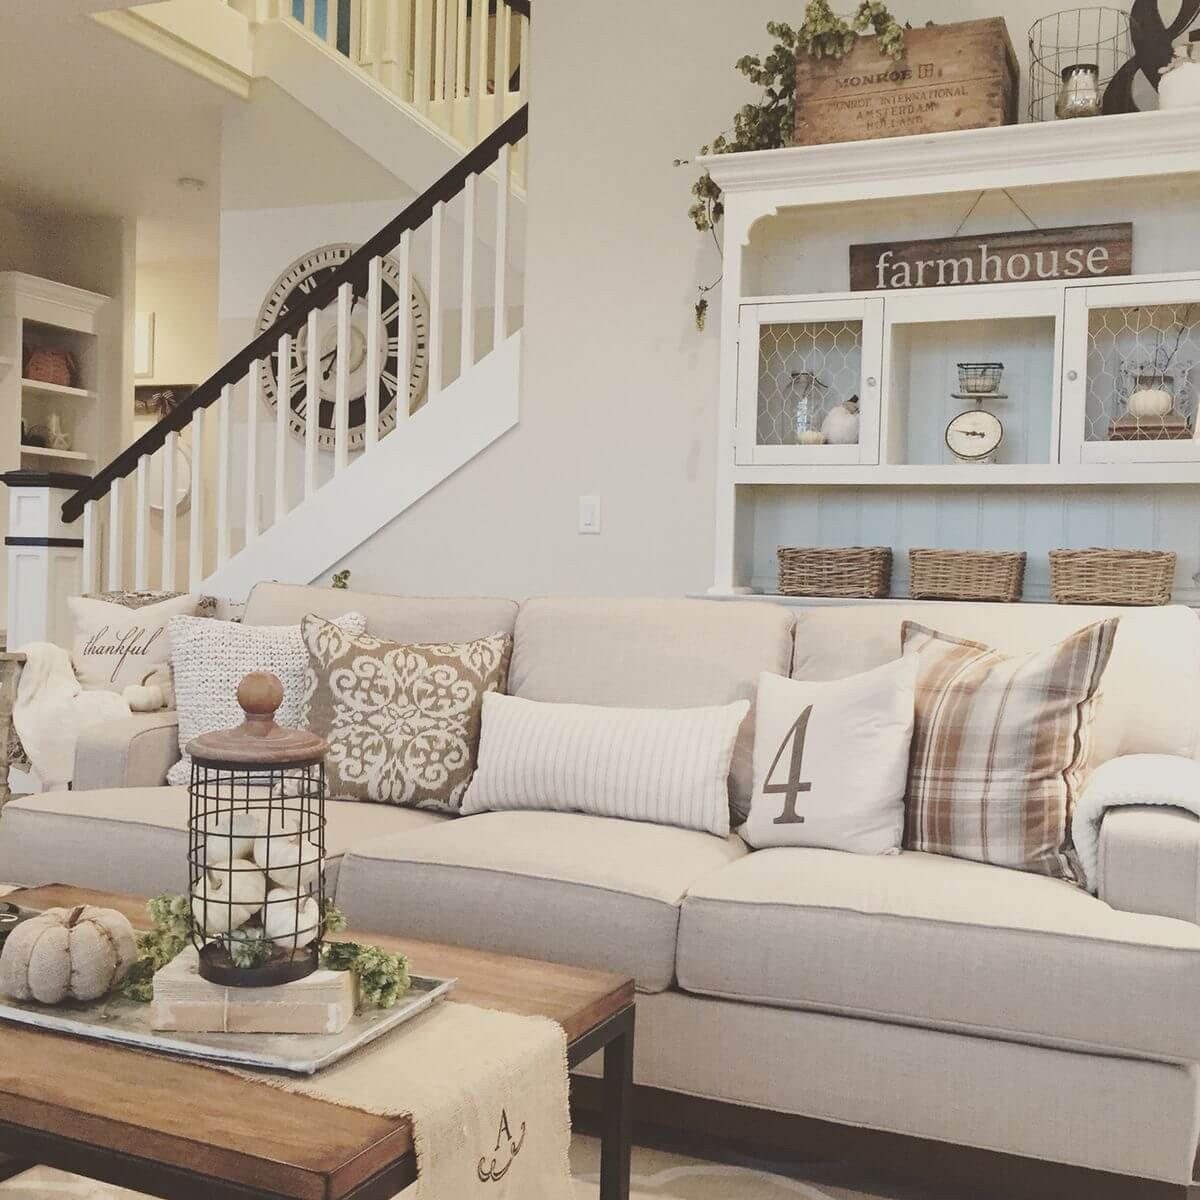 Modern Farmhouse Living Room Decorating Ideas Awesome 35 Best Farmhouse Living Room Decor Ideas and Designs for 2017